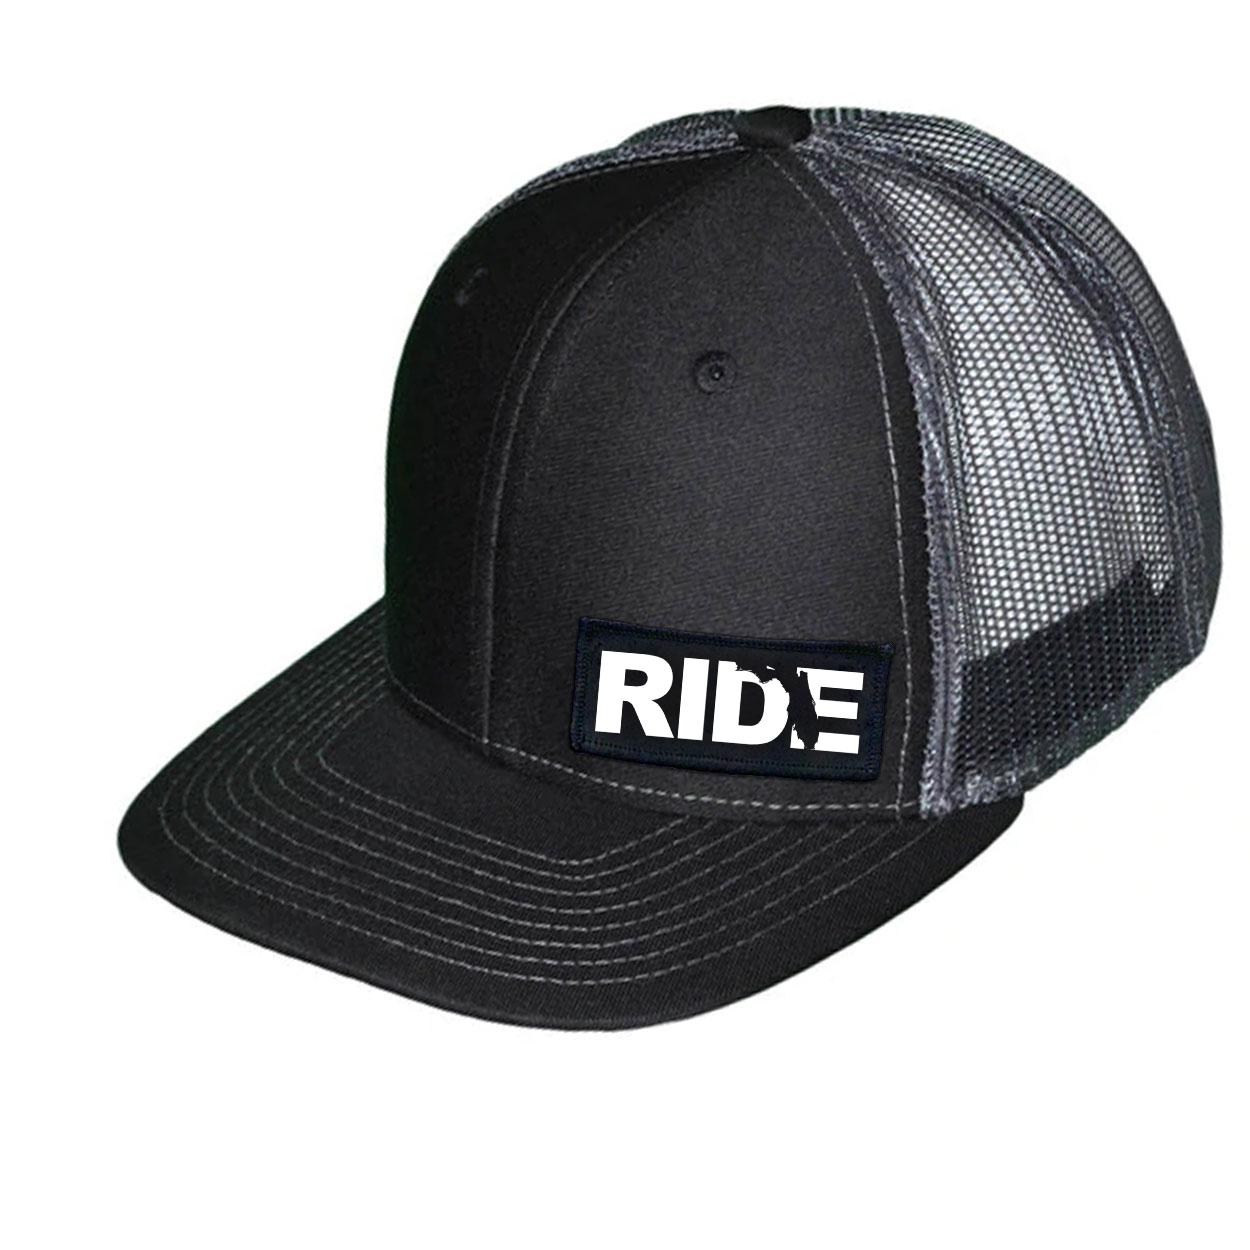 Ride Florida Night Out Woven Patch Snapback Trucker Hat Black/Dark Gray (White Logo)